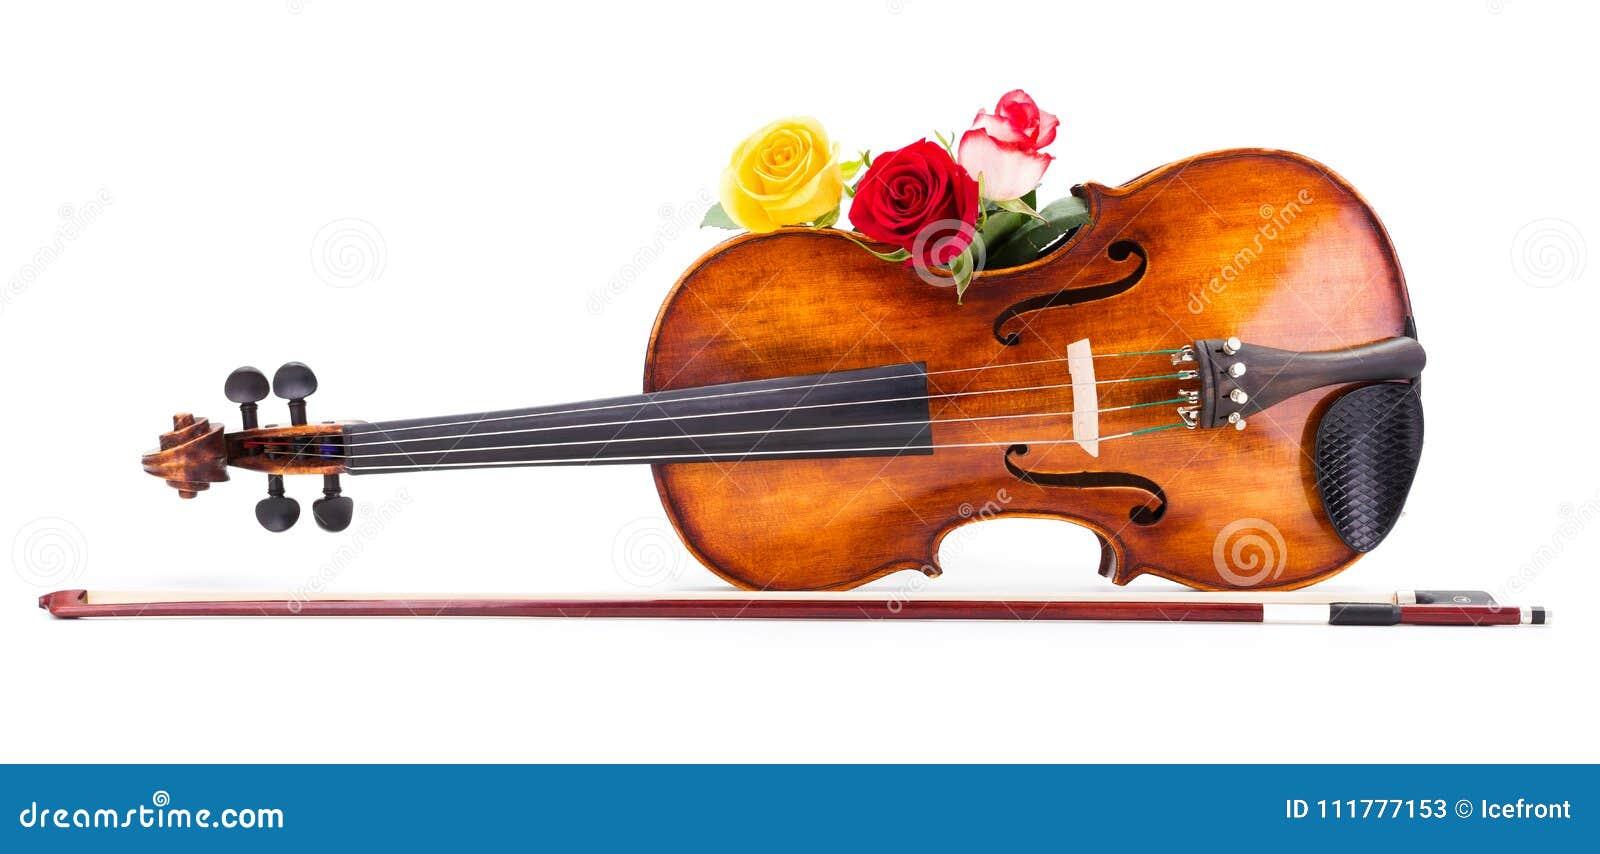 Roses on violin